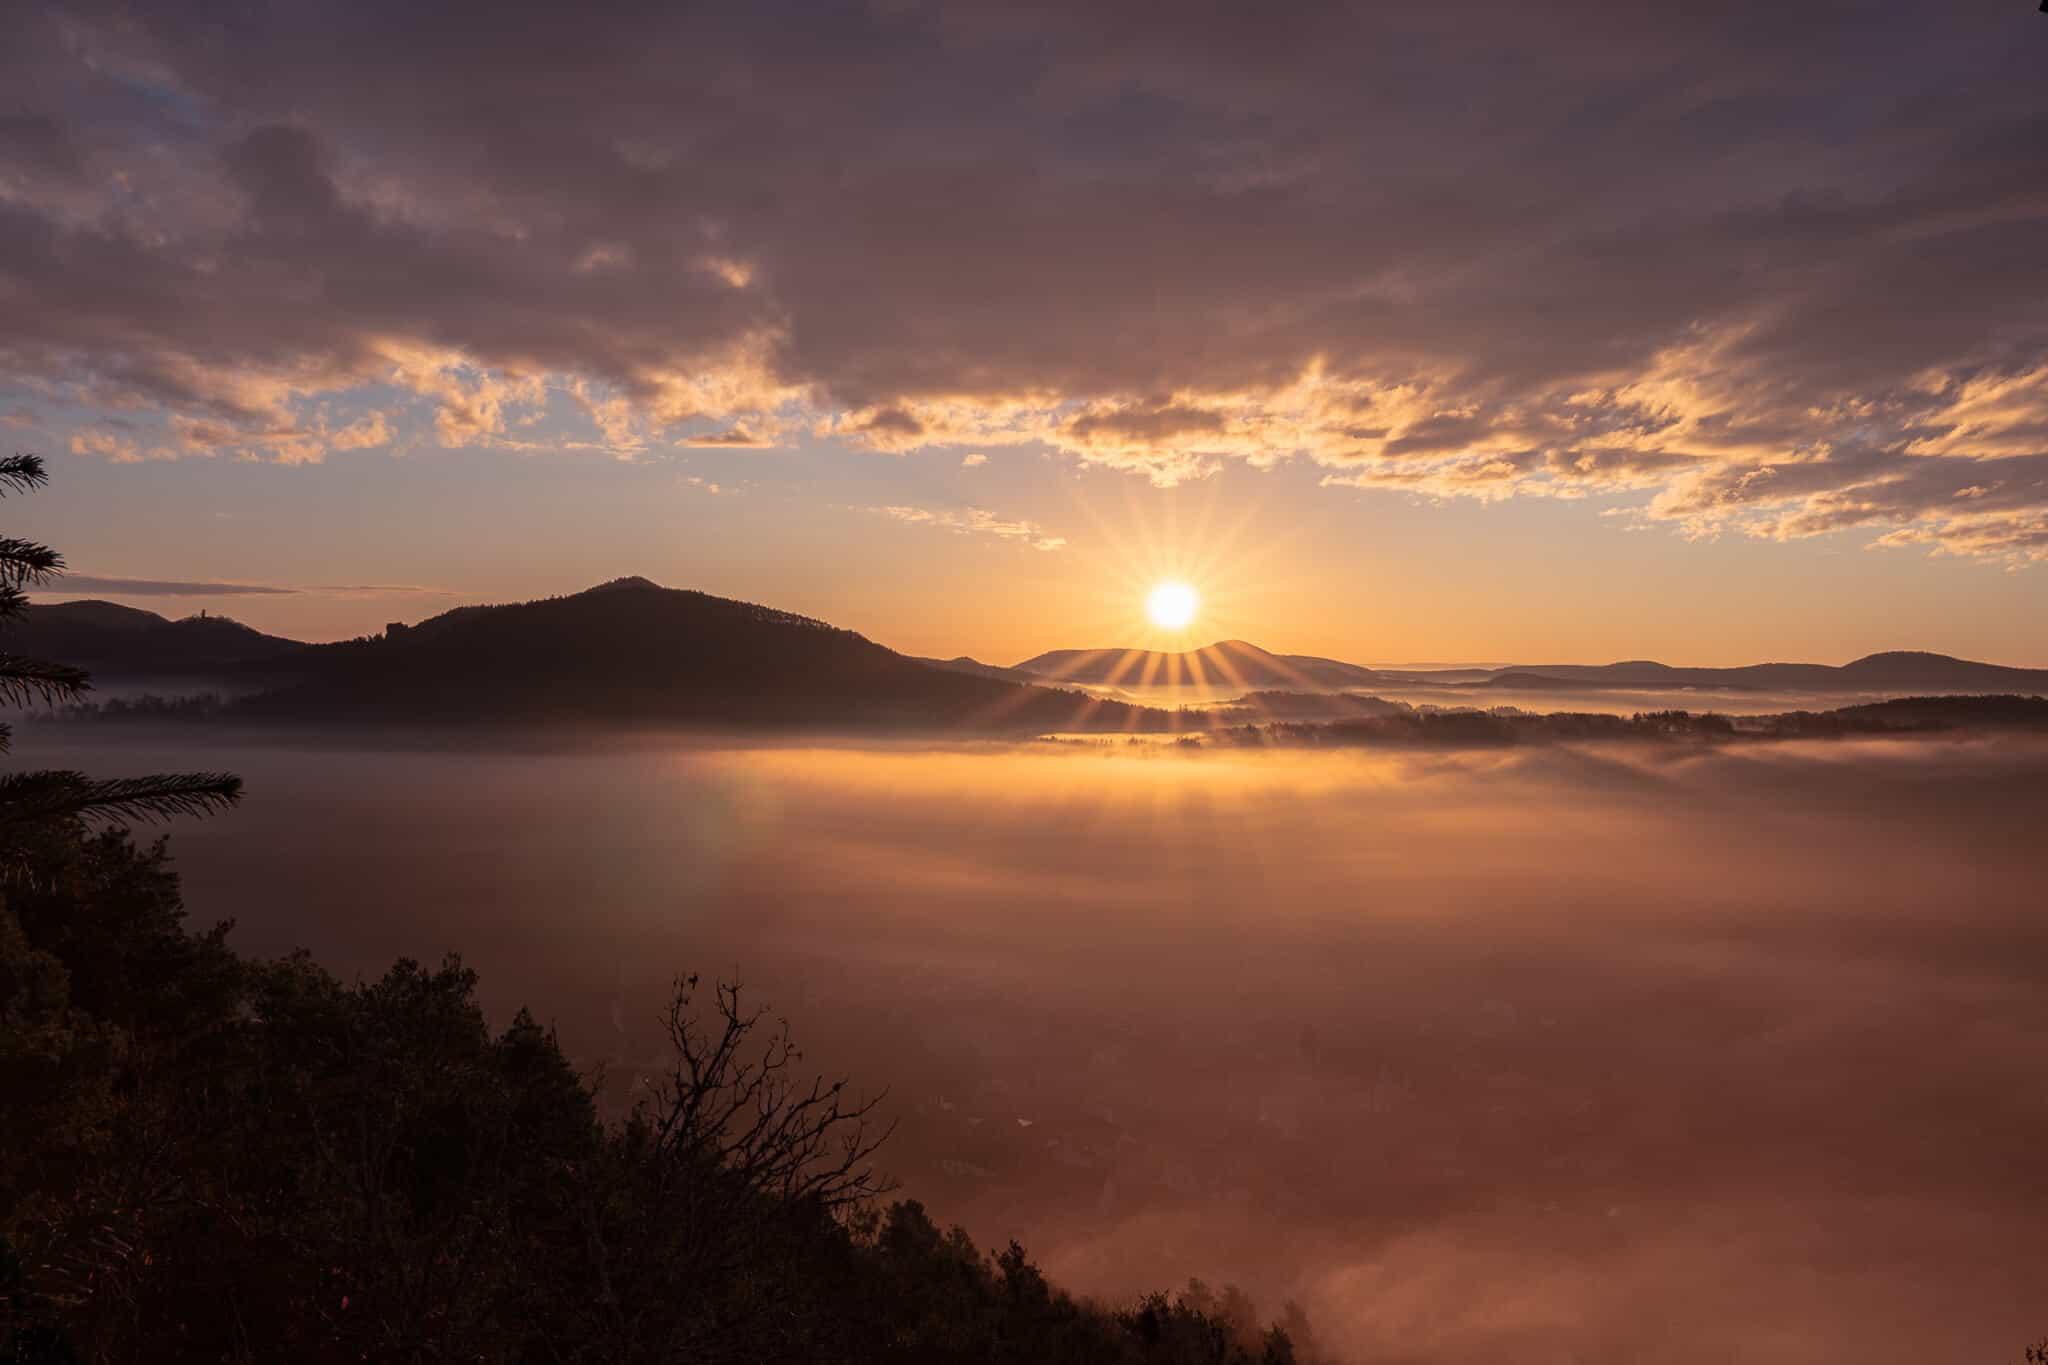 Sonnenaufgang vom Wachtfels